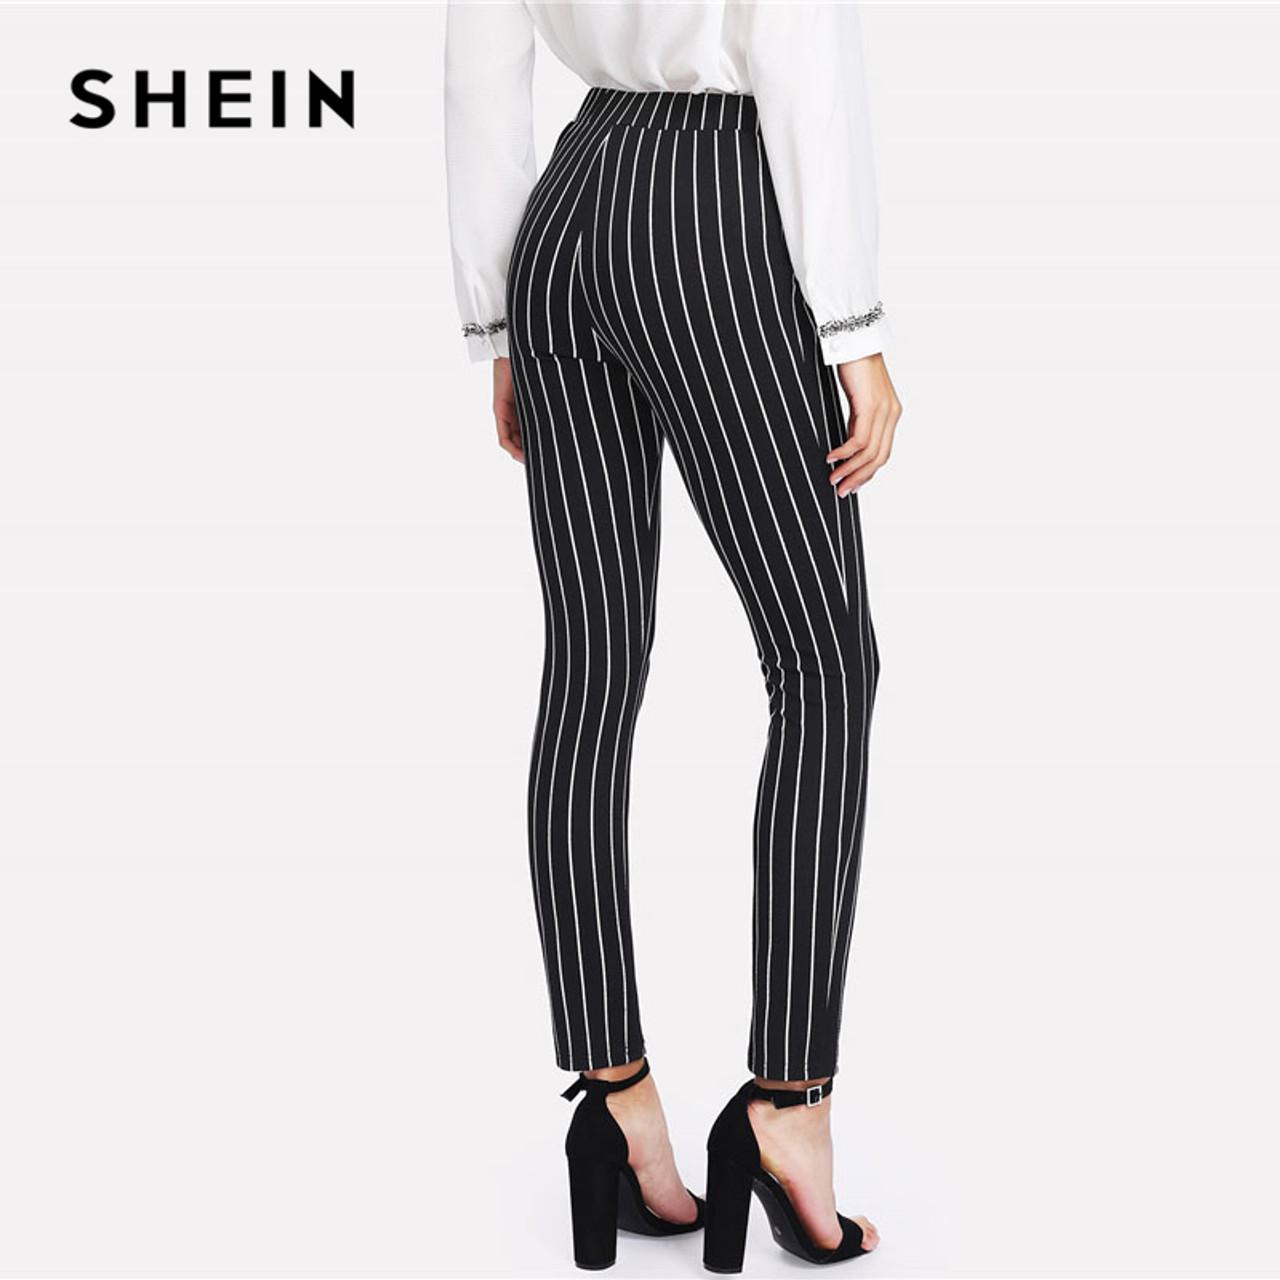 720e22ea9 ... SHEIN Vertical Striped Skinny Pants Women Elastic Waist Pocket OL Style  Work Trousers 2018 Spring Mid ...